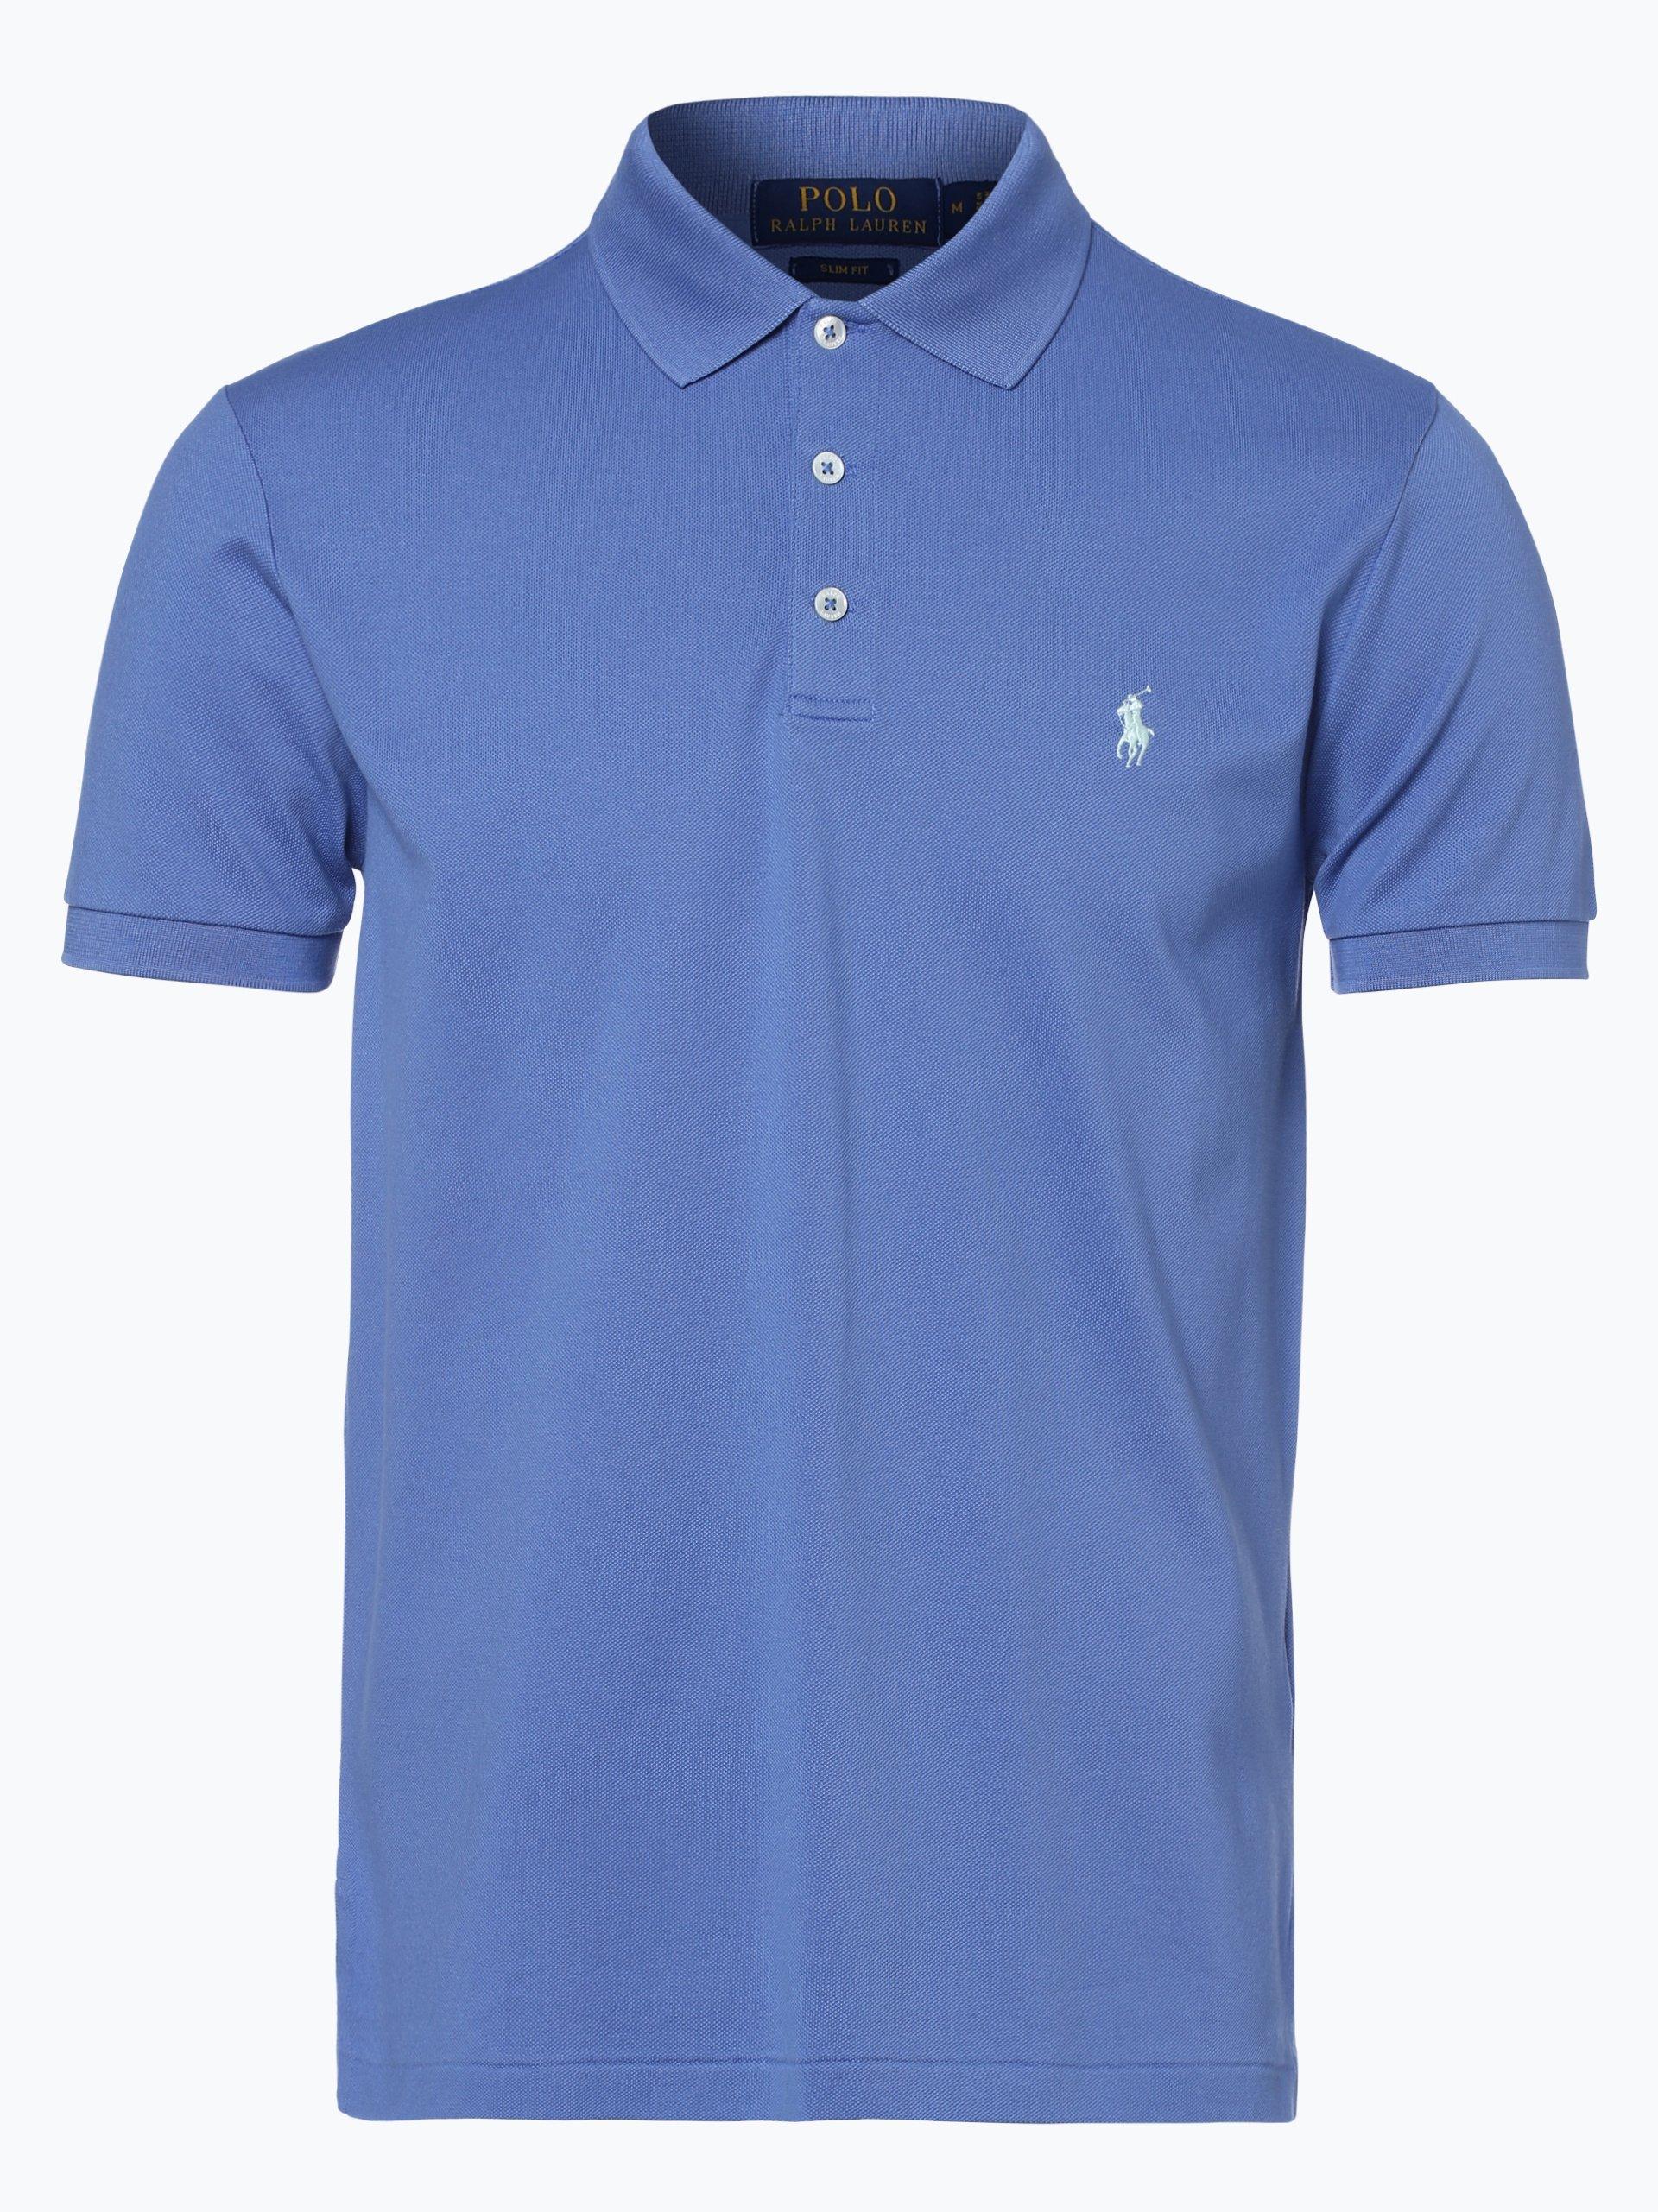 Polo Ralph Lauren Herren Poloshirt Slim Fit